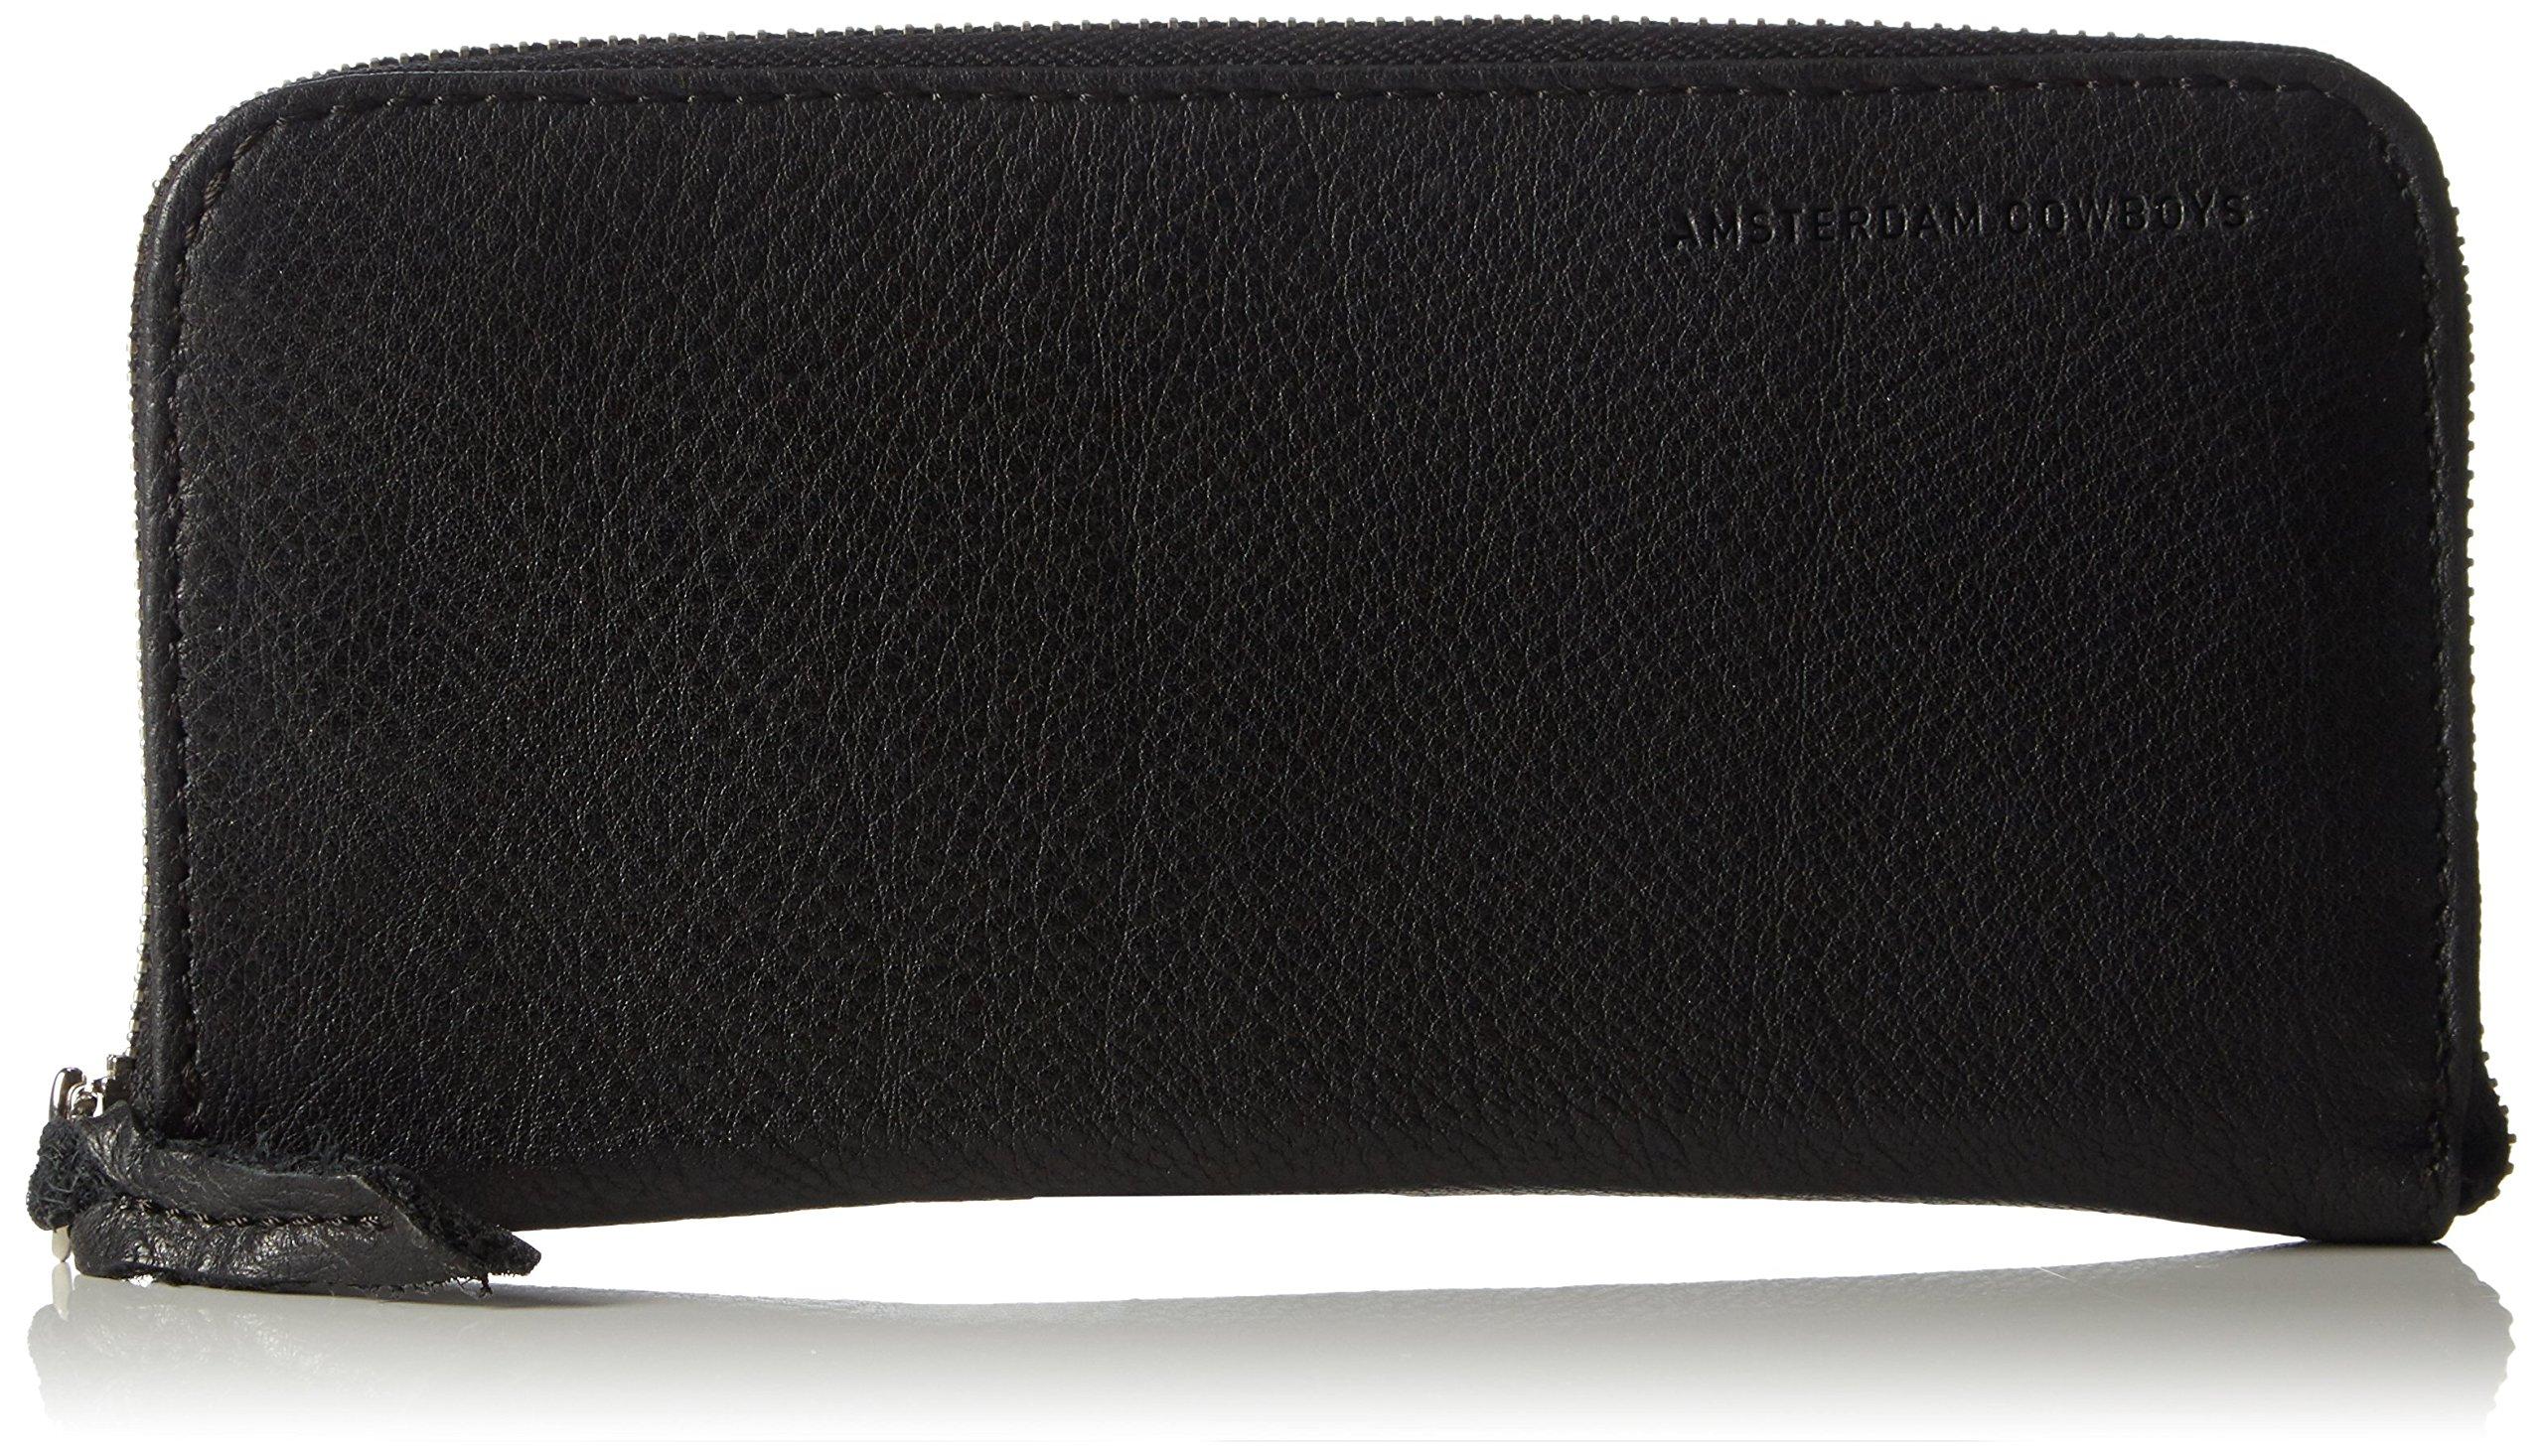 COWBOYSBELT Women's Acle Black Checkbook Wallet